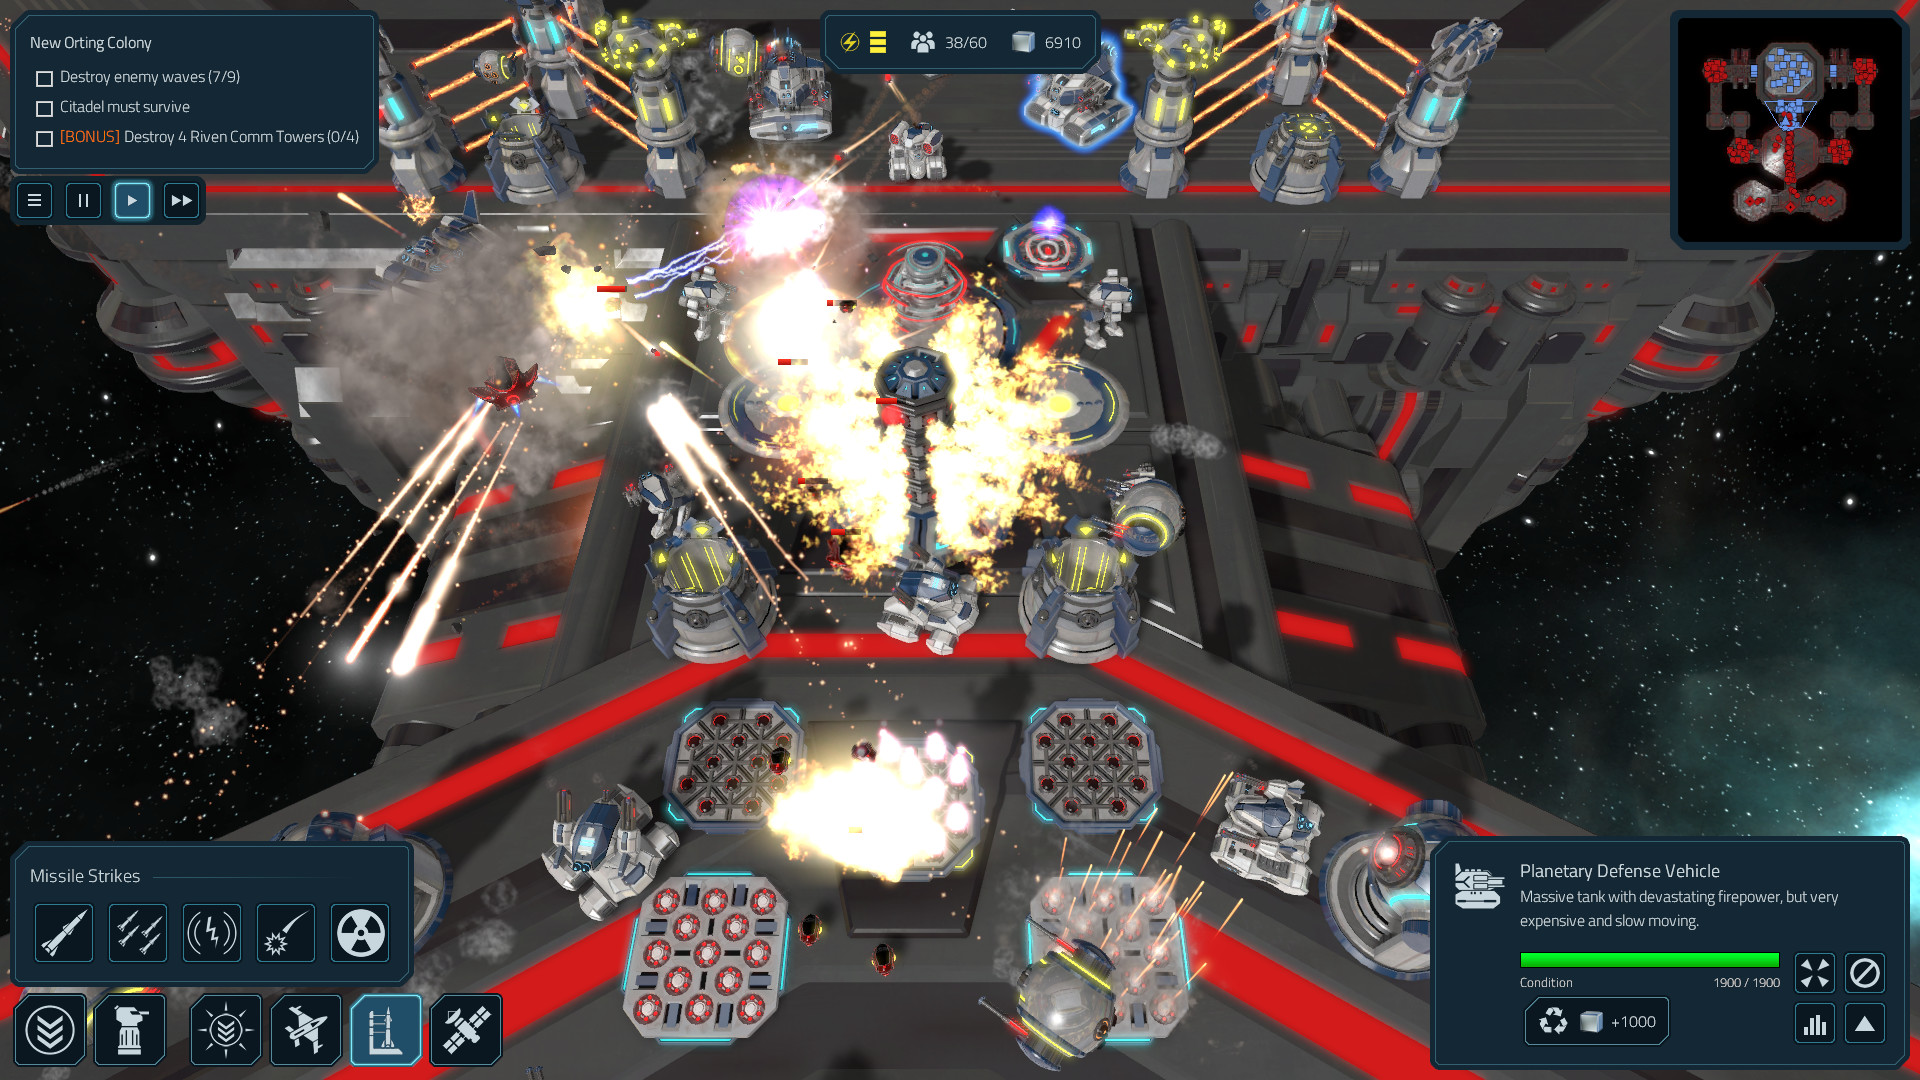 colony-siege-pc-screenshot-04